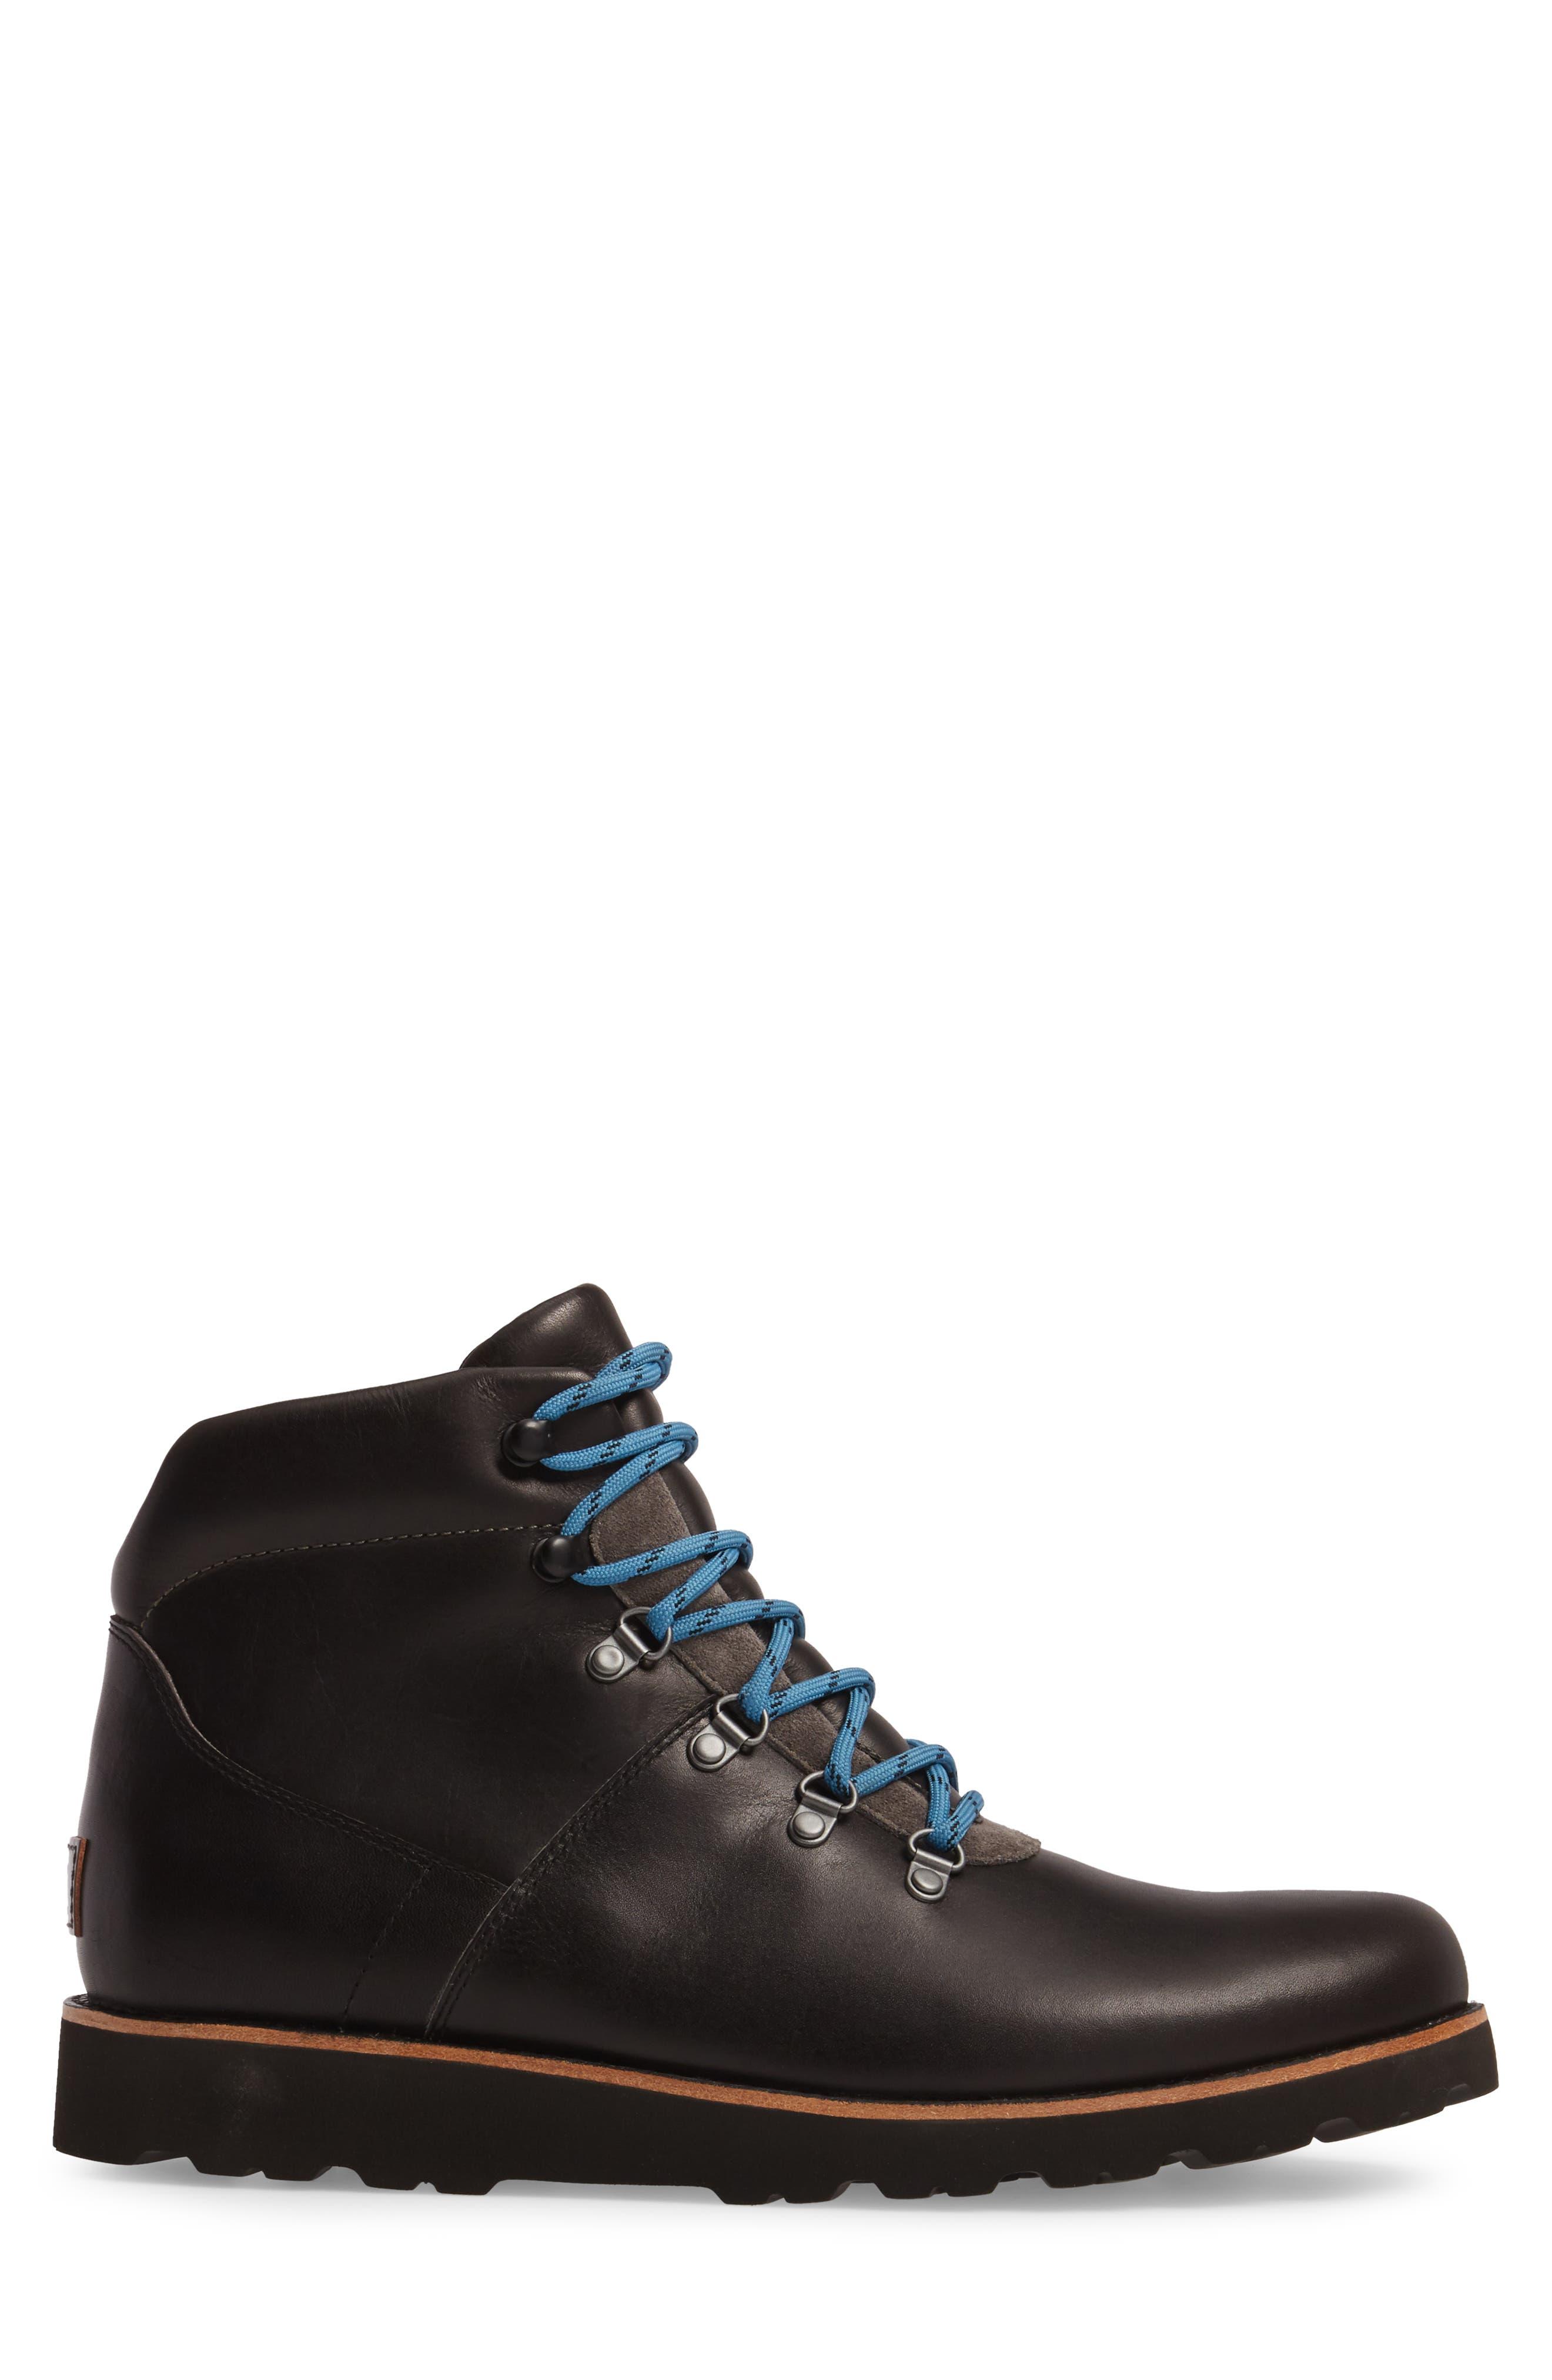 Halfstein Plain Toe Boot,                             Alternate thumbnail 3, color,                             CHARCOAL